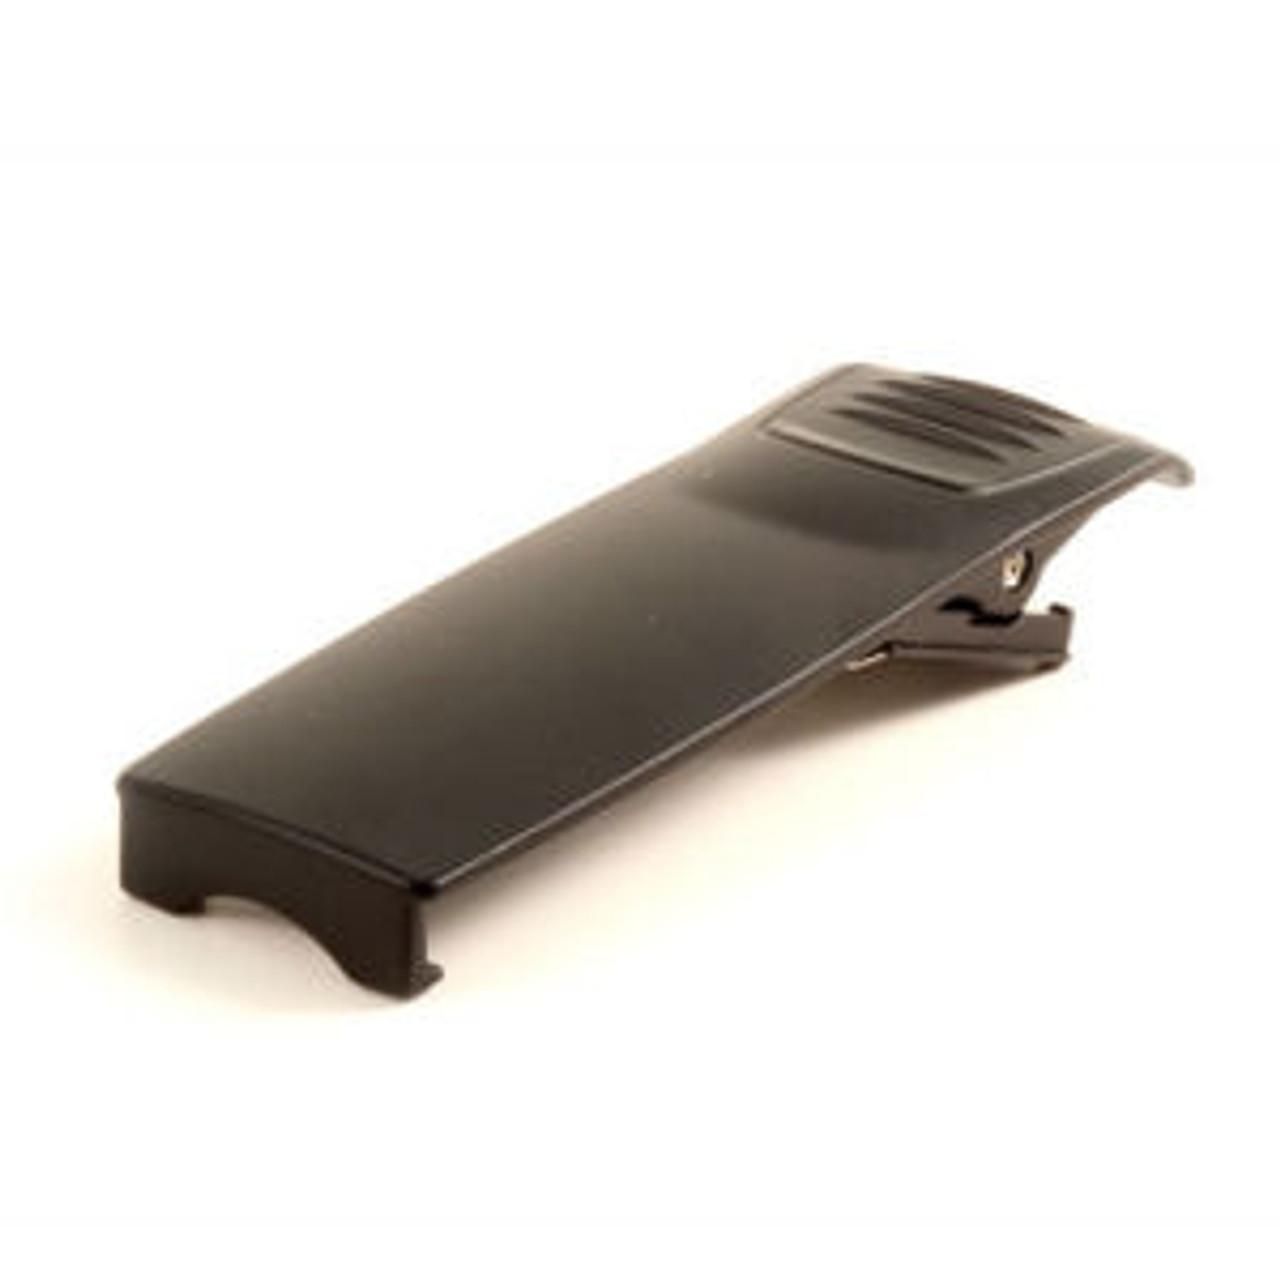 M/A-Com P7150 Metal, Spring Loaded Belt Clip